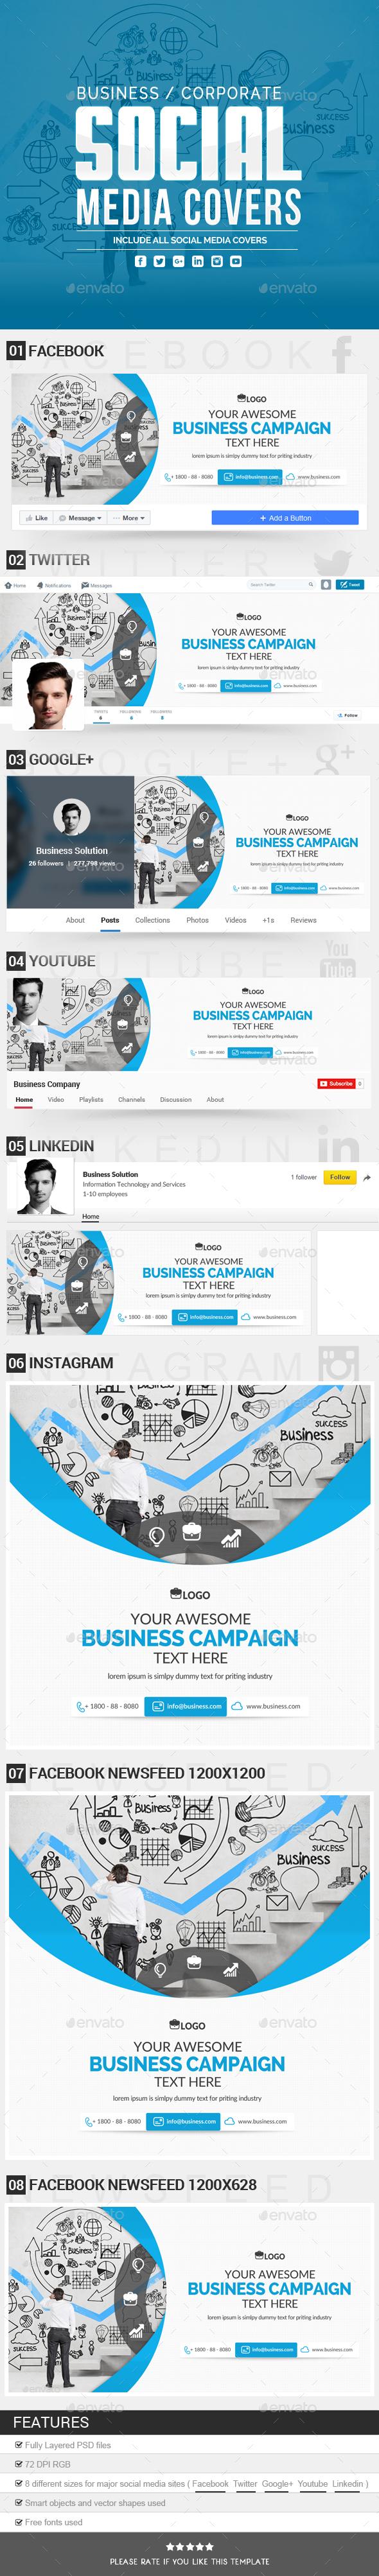 Business Social Media Covers - Social Media Web Elements